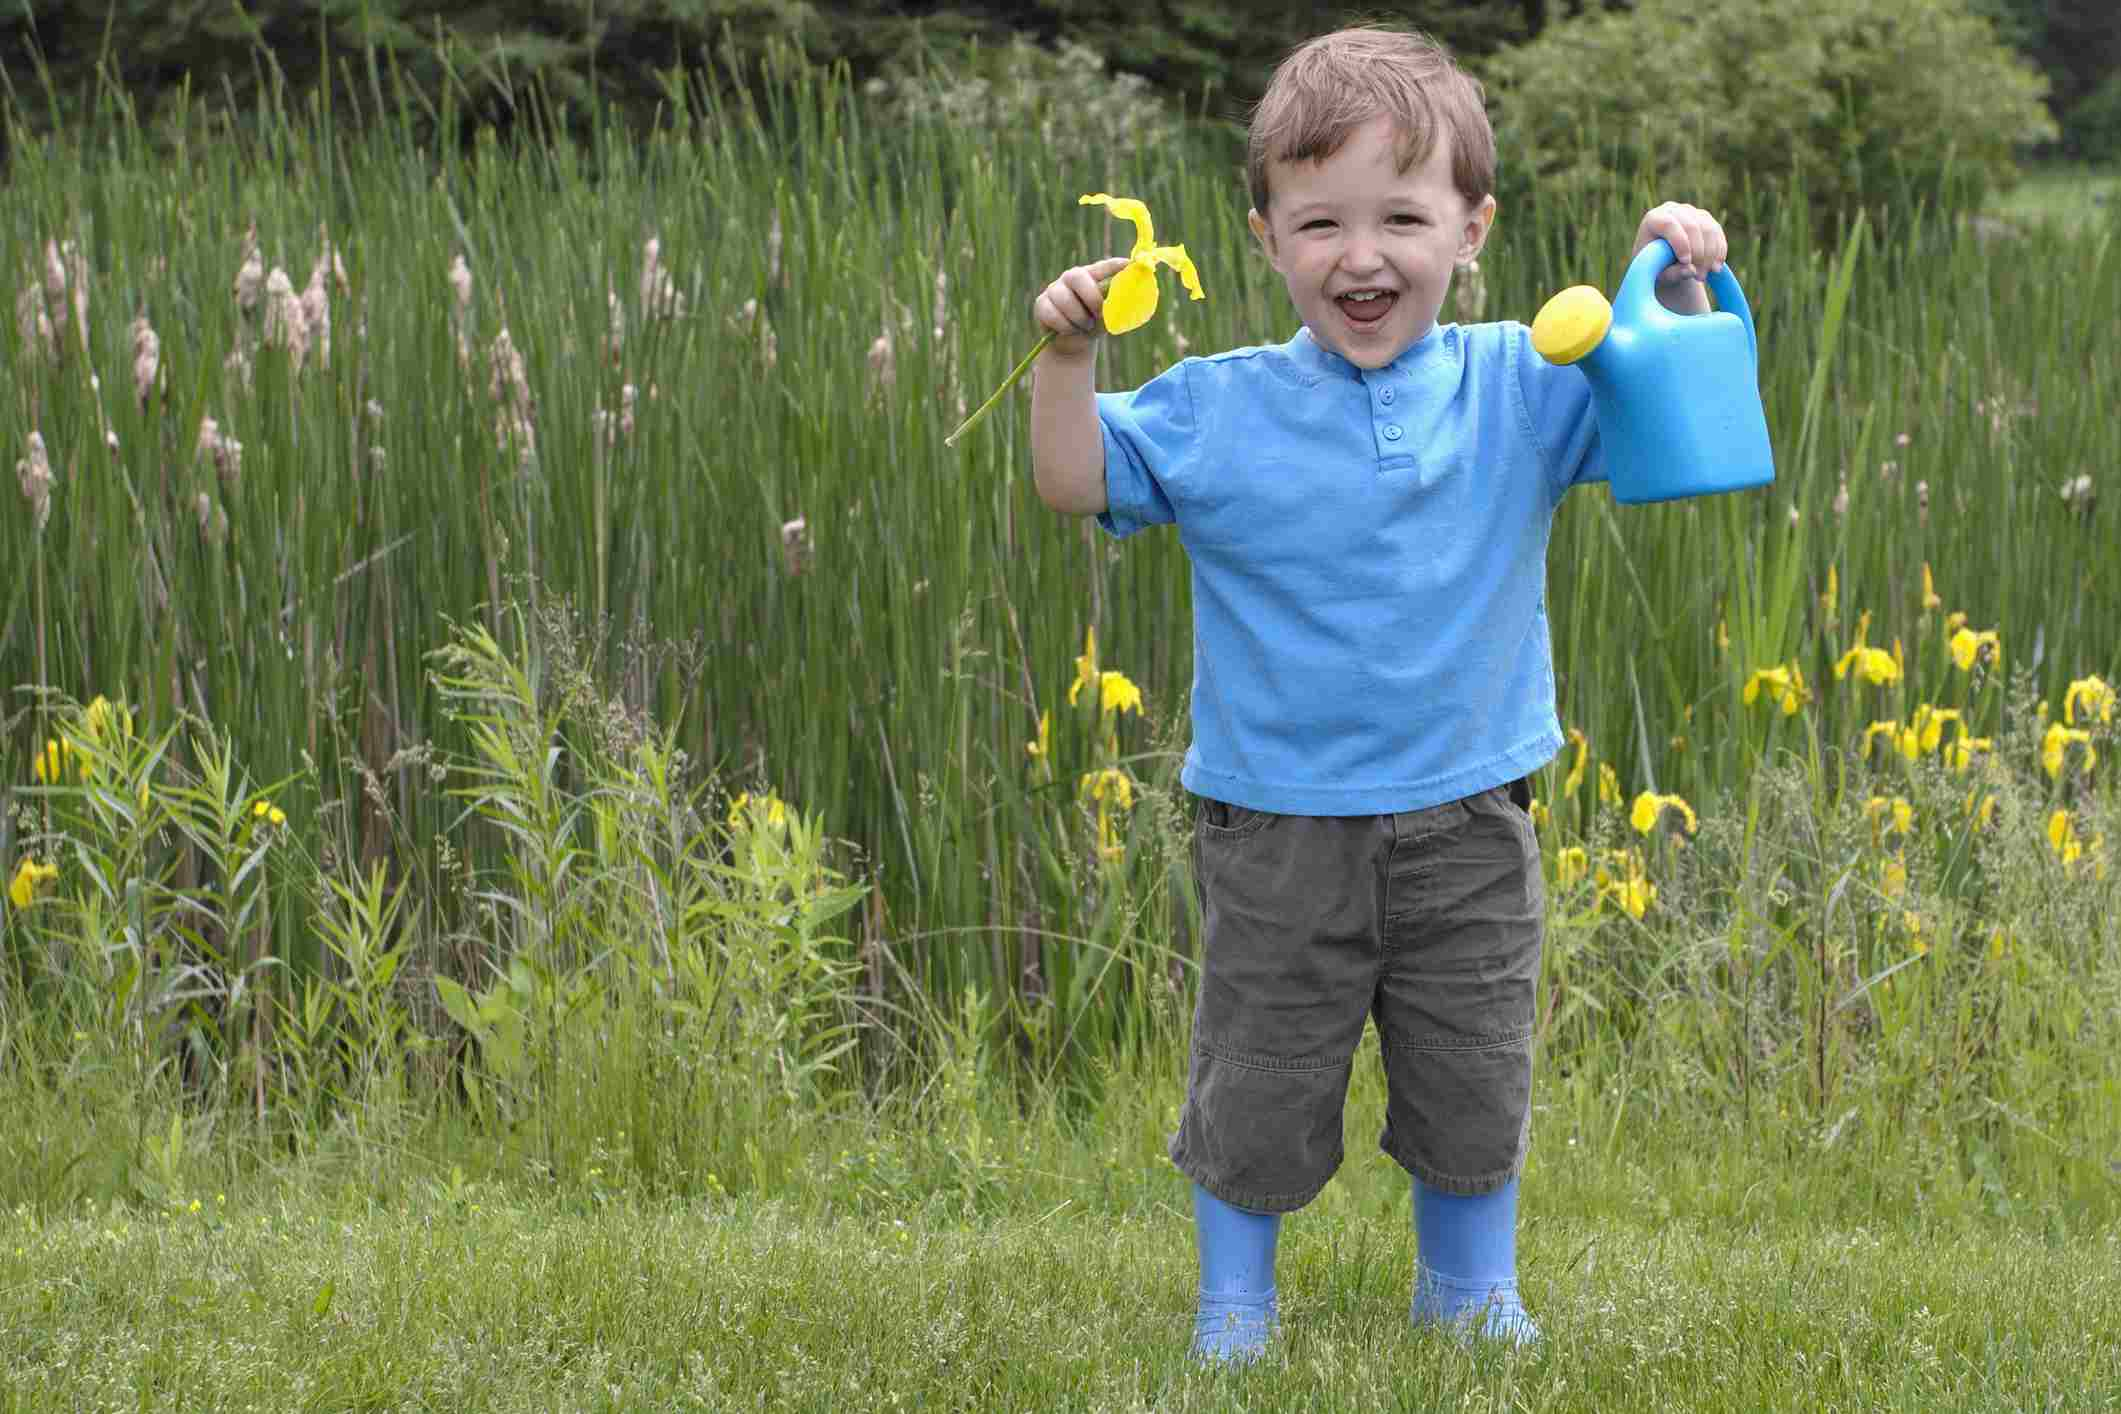 Niño con balde azul vestido de azul con telón de fondo de flores de bandera amarilla en pantano